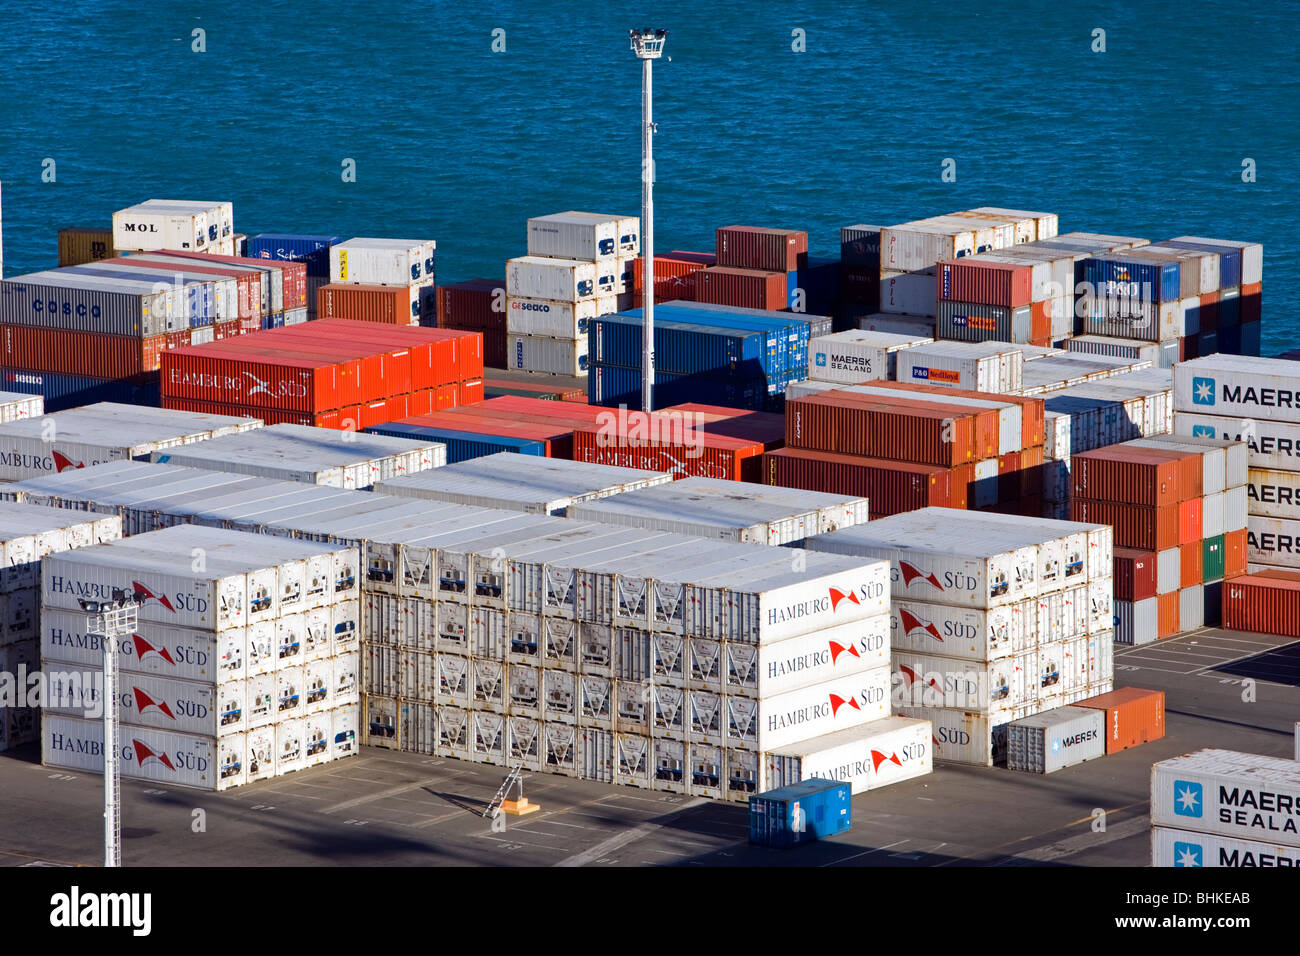 Port of Napier, New Zealand - Stock Image